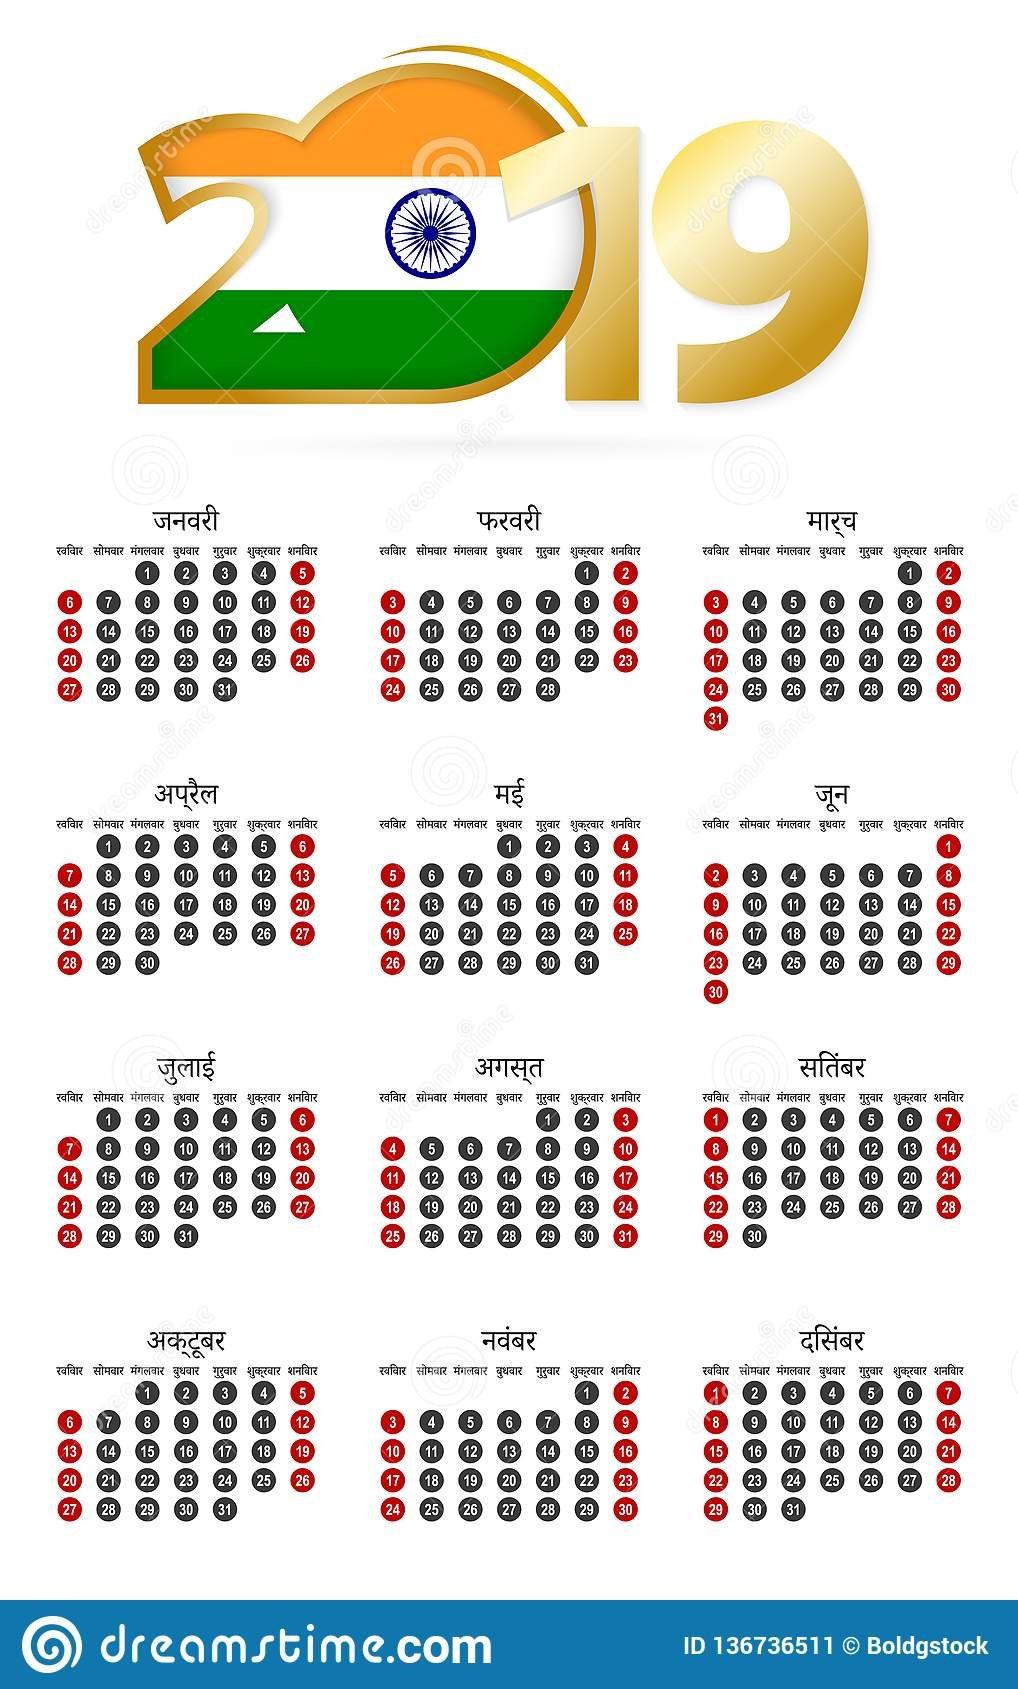 Hindi Calendar 2019 With Numbers In Circles, Week Starts On Sunday Calendar 2019 Hindi